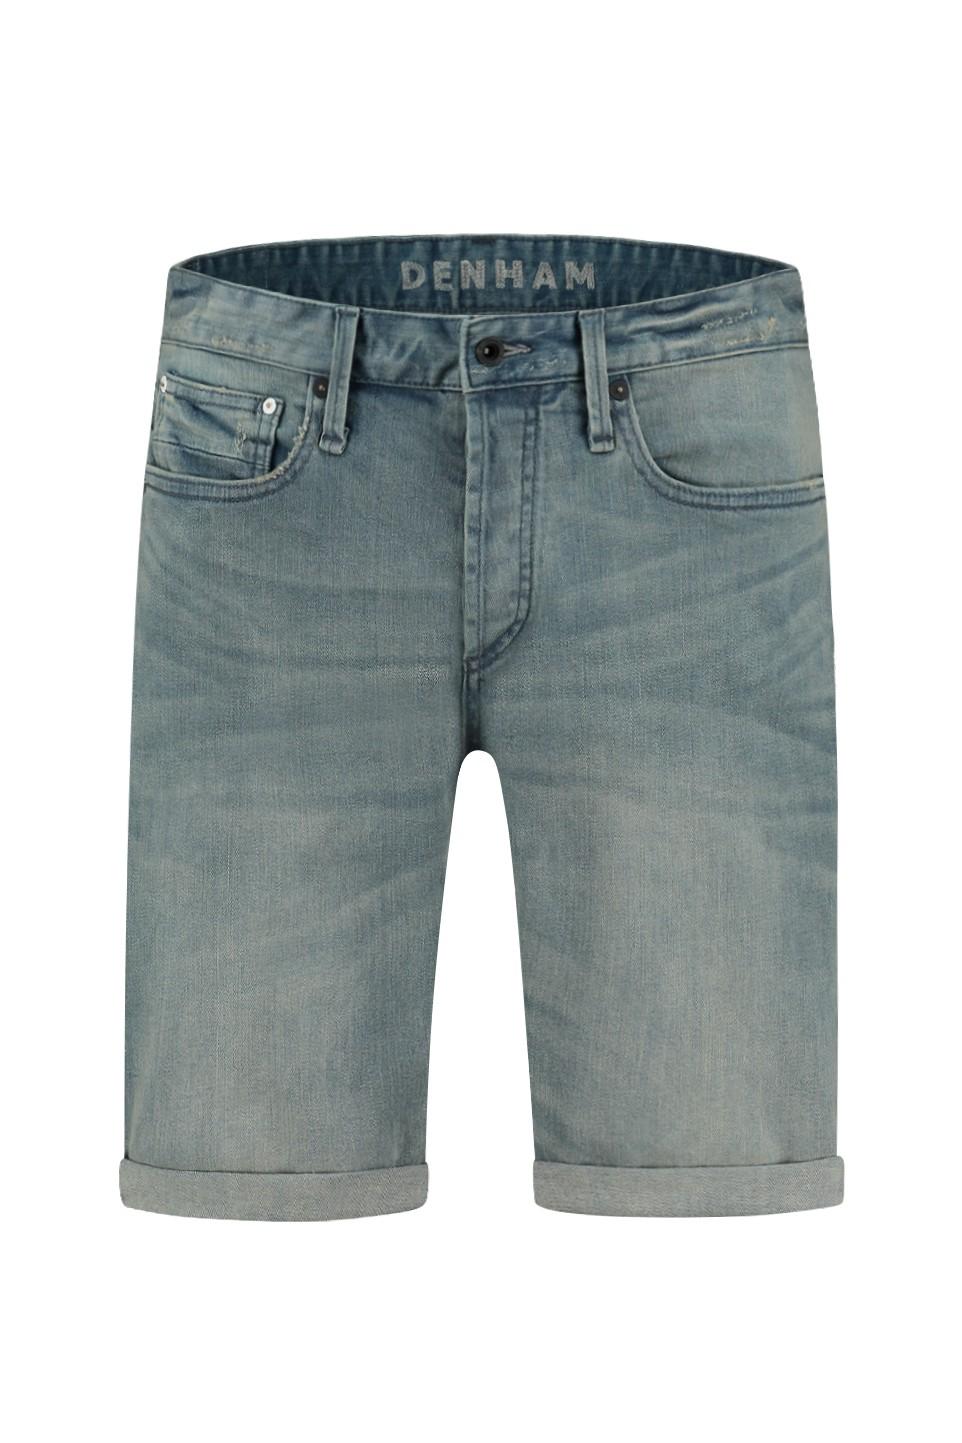 Pin op Denham The Jeanmaker